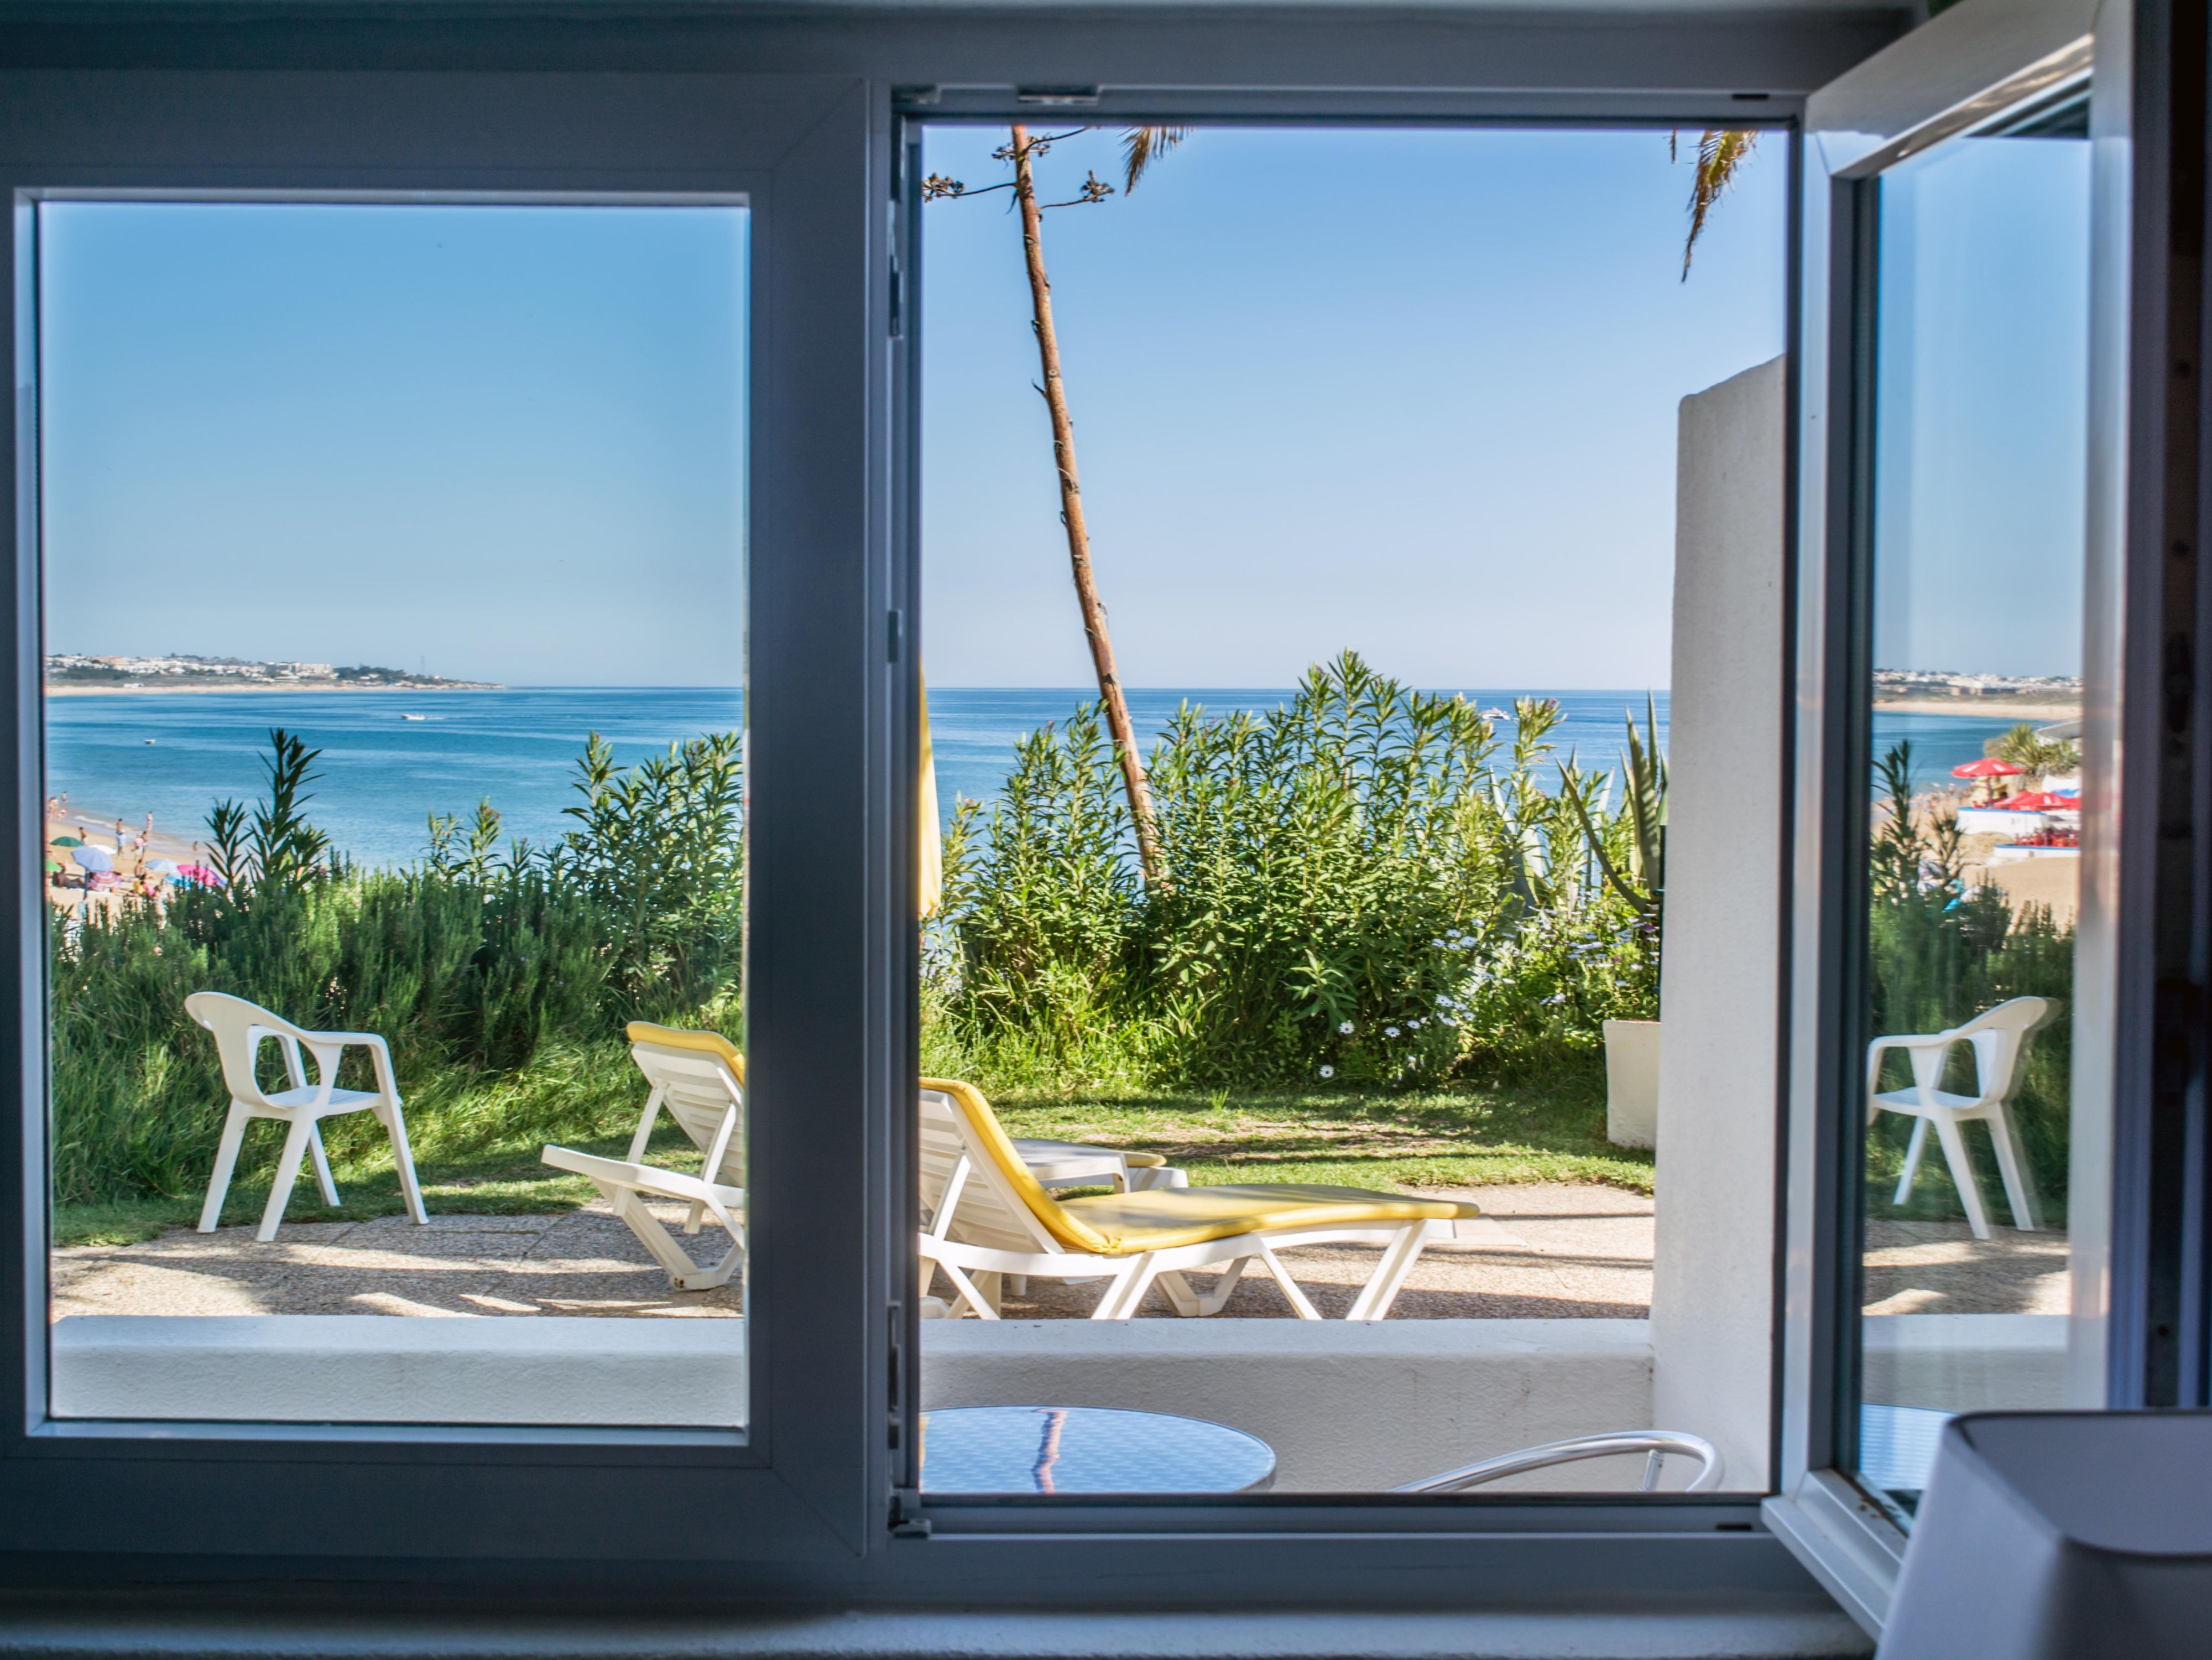 Holiday Inn Algarve hotéis Algarve Armacao De Pera Tarifas de  #326C99